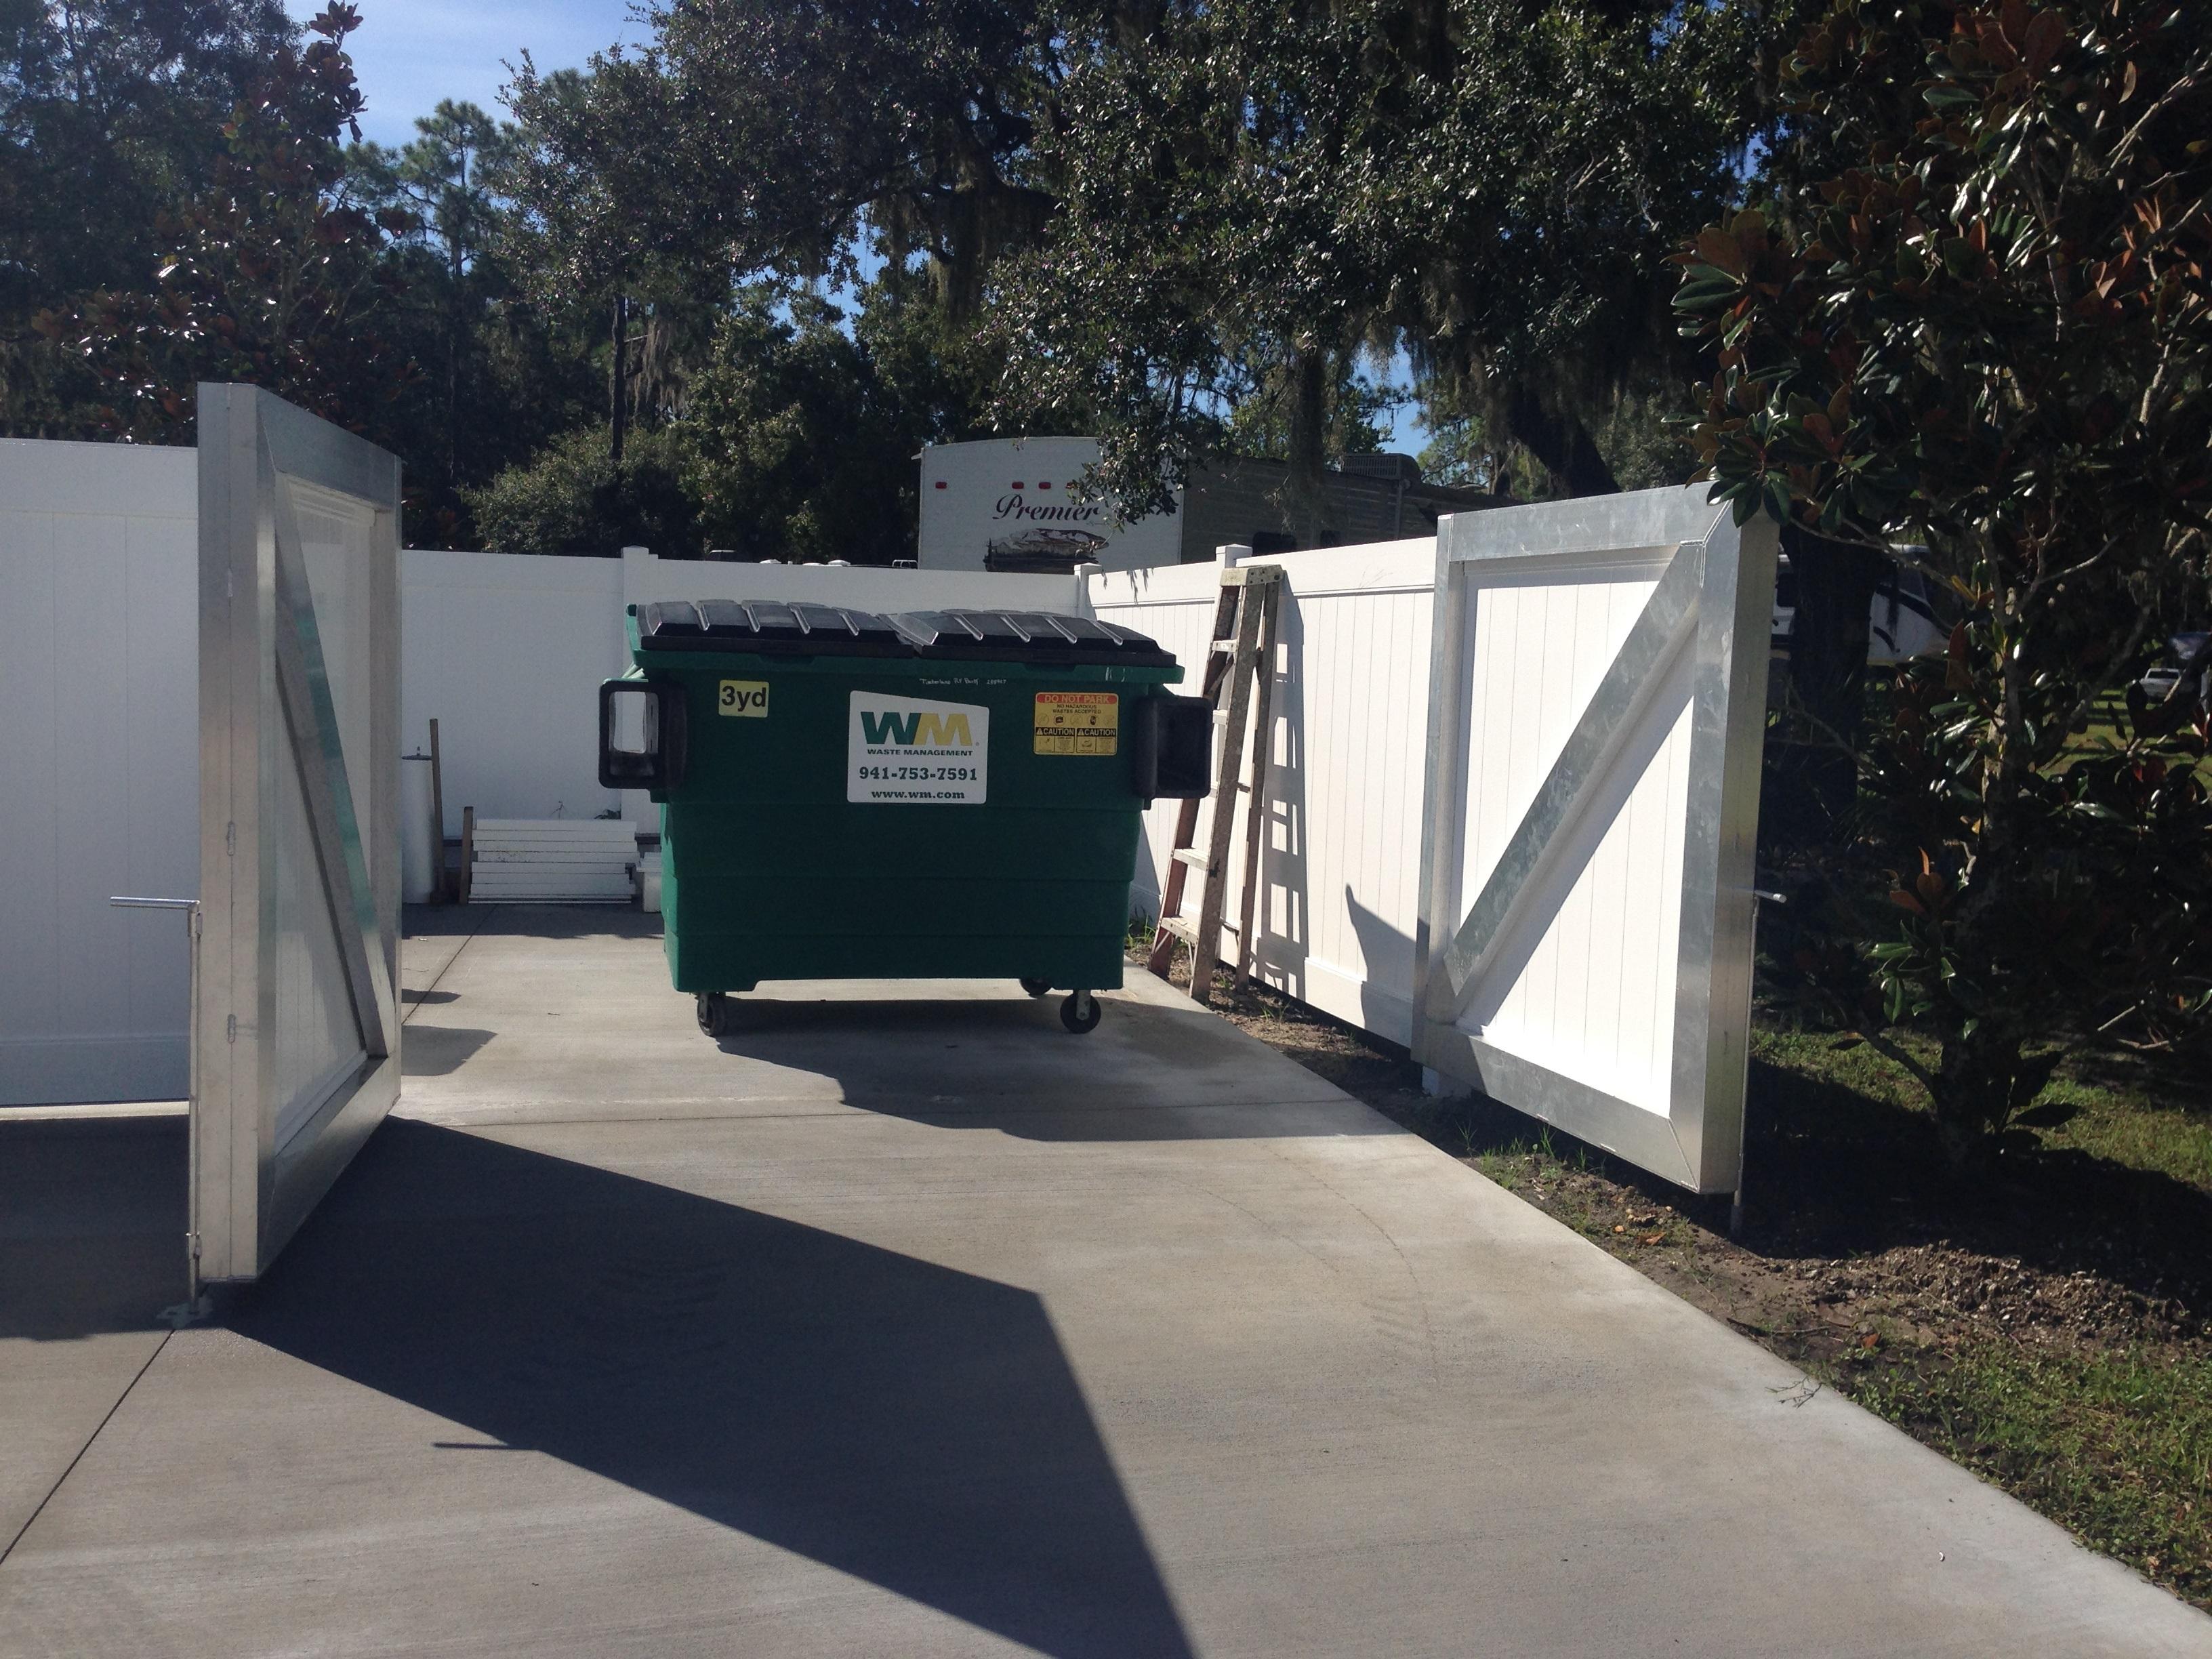 New Dumpster Timberlane Rv Park And Resort